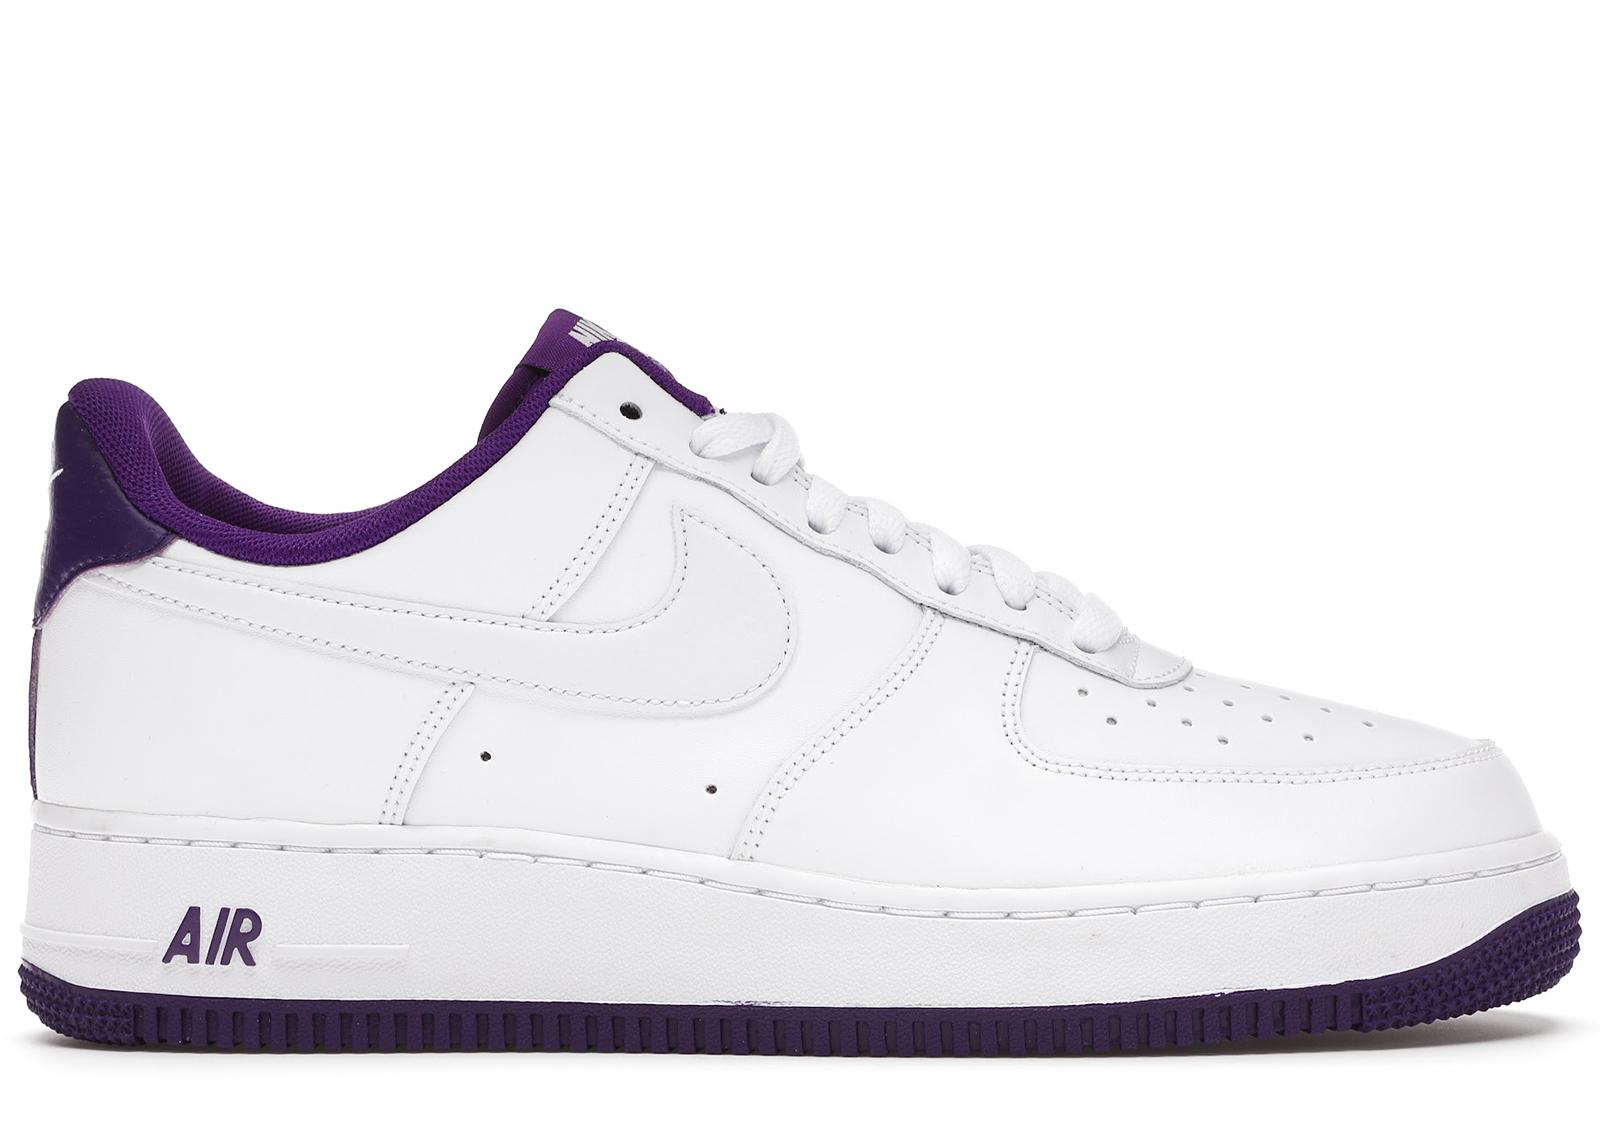 Nike Air Force 1 '07 Voltage Purple